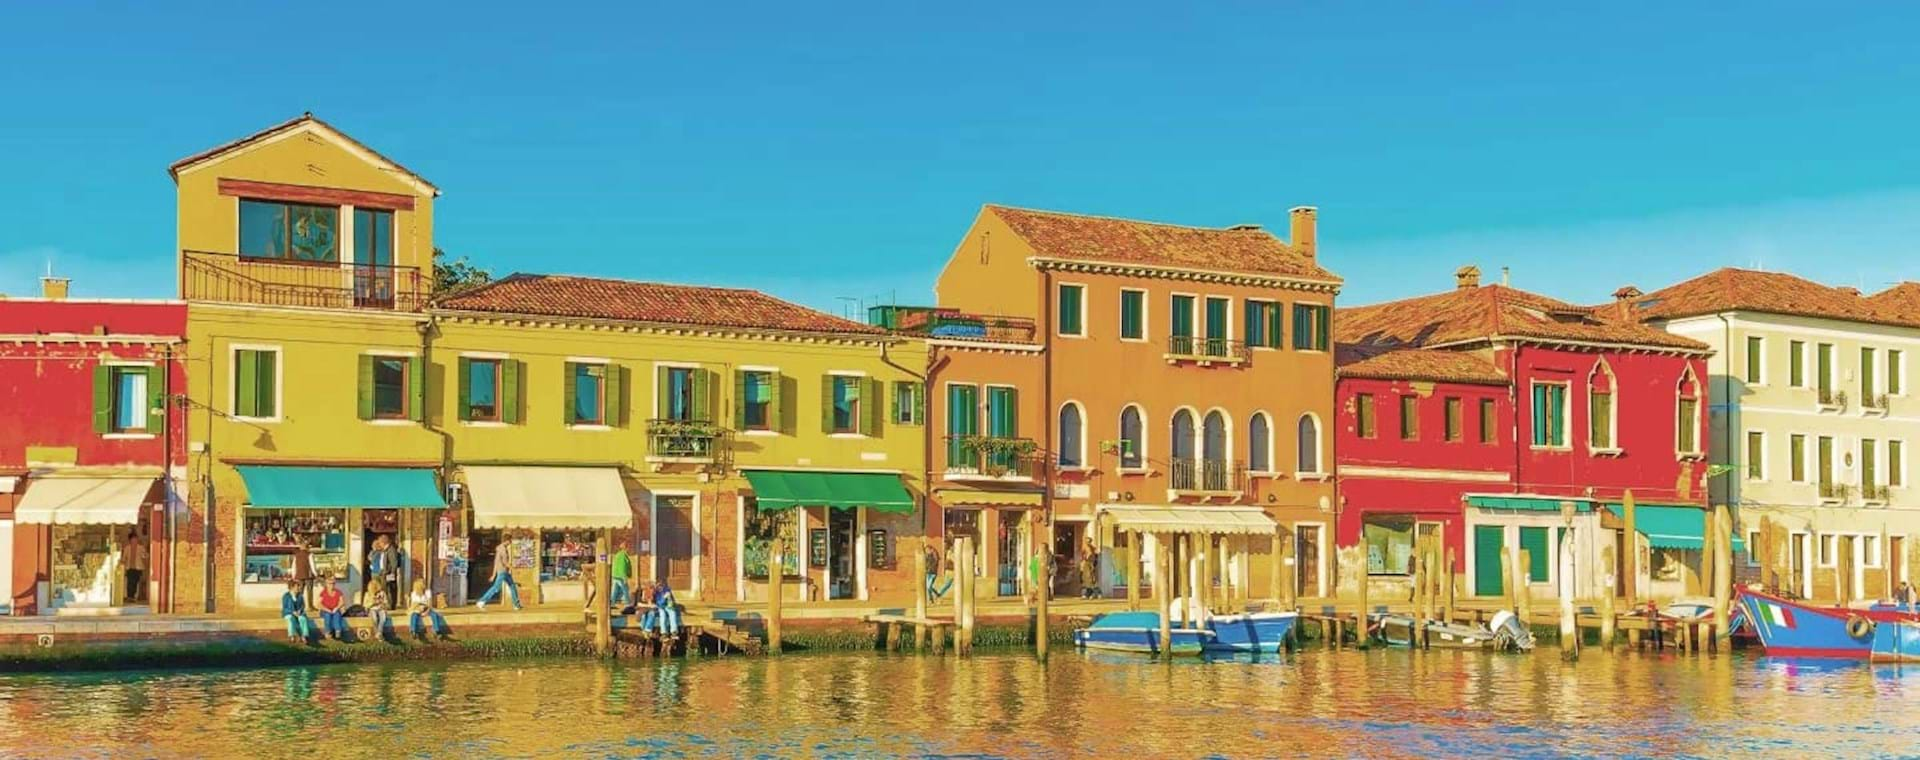 VIP Venetian Island Experience: Murano, Burano & Torcello Tour